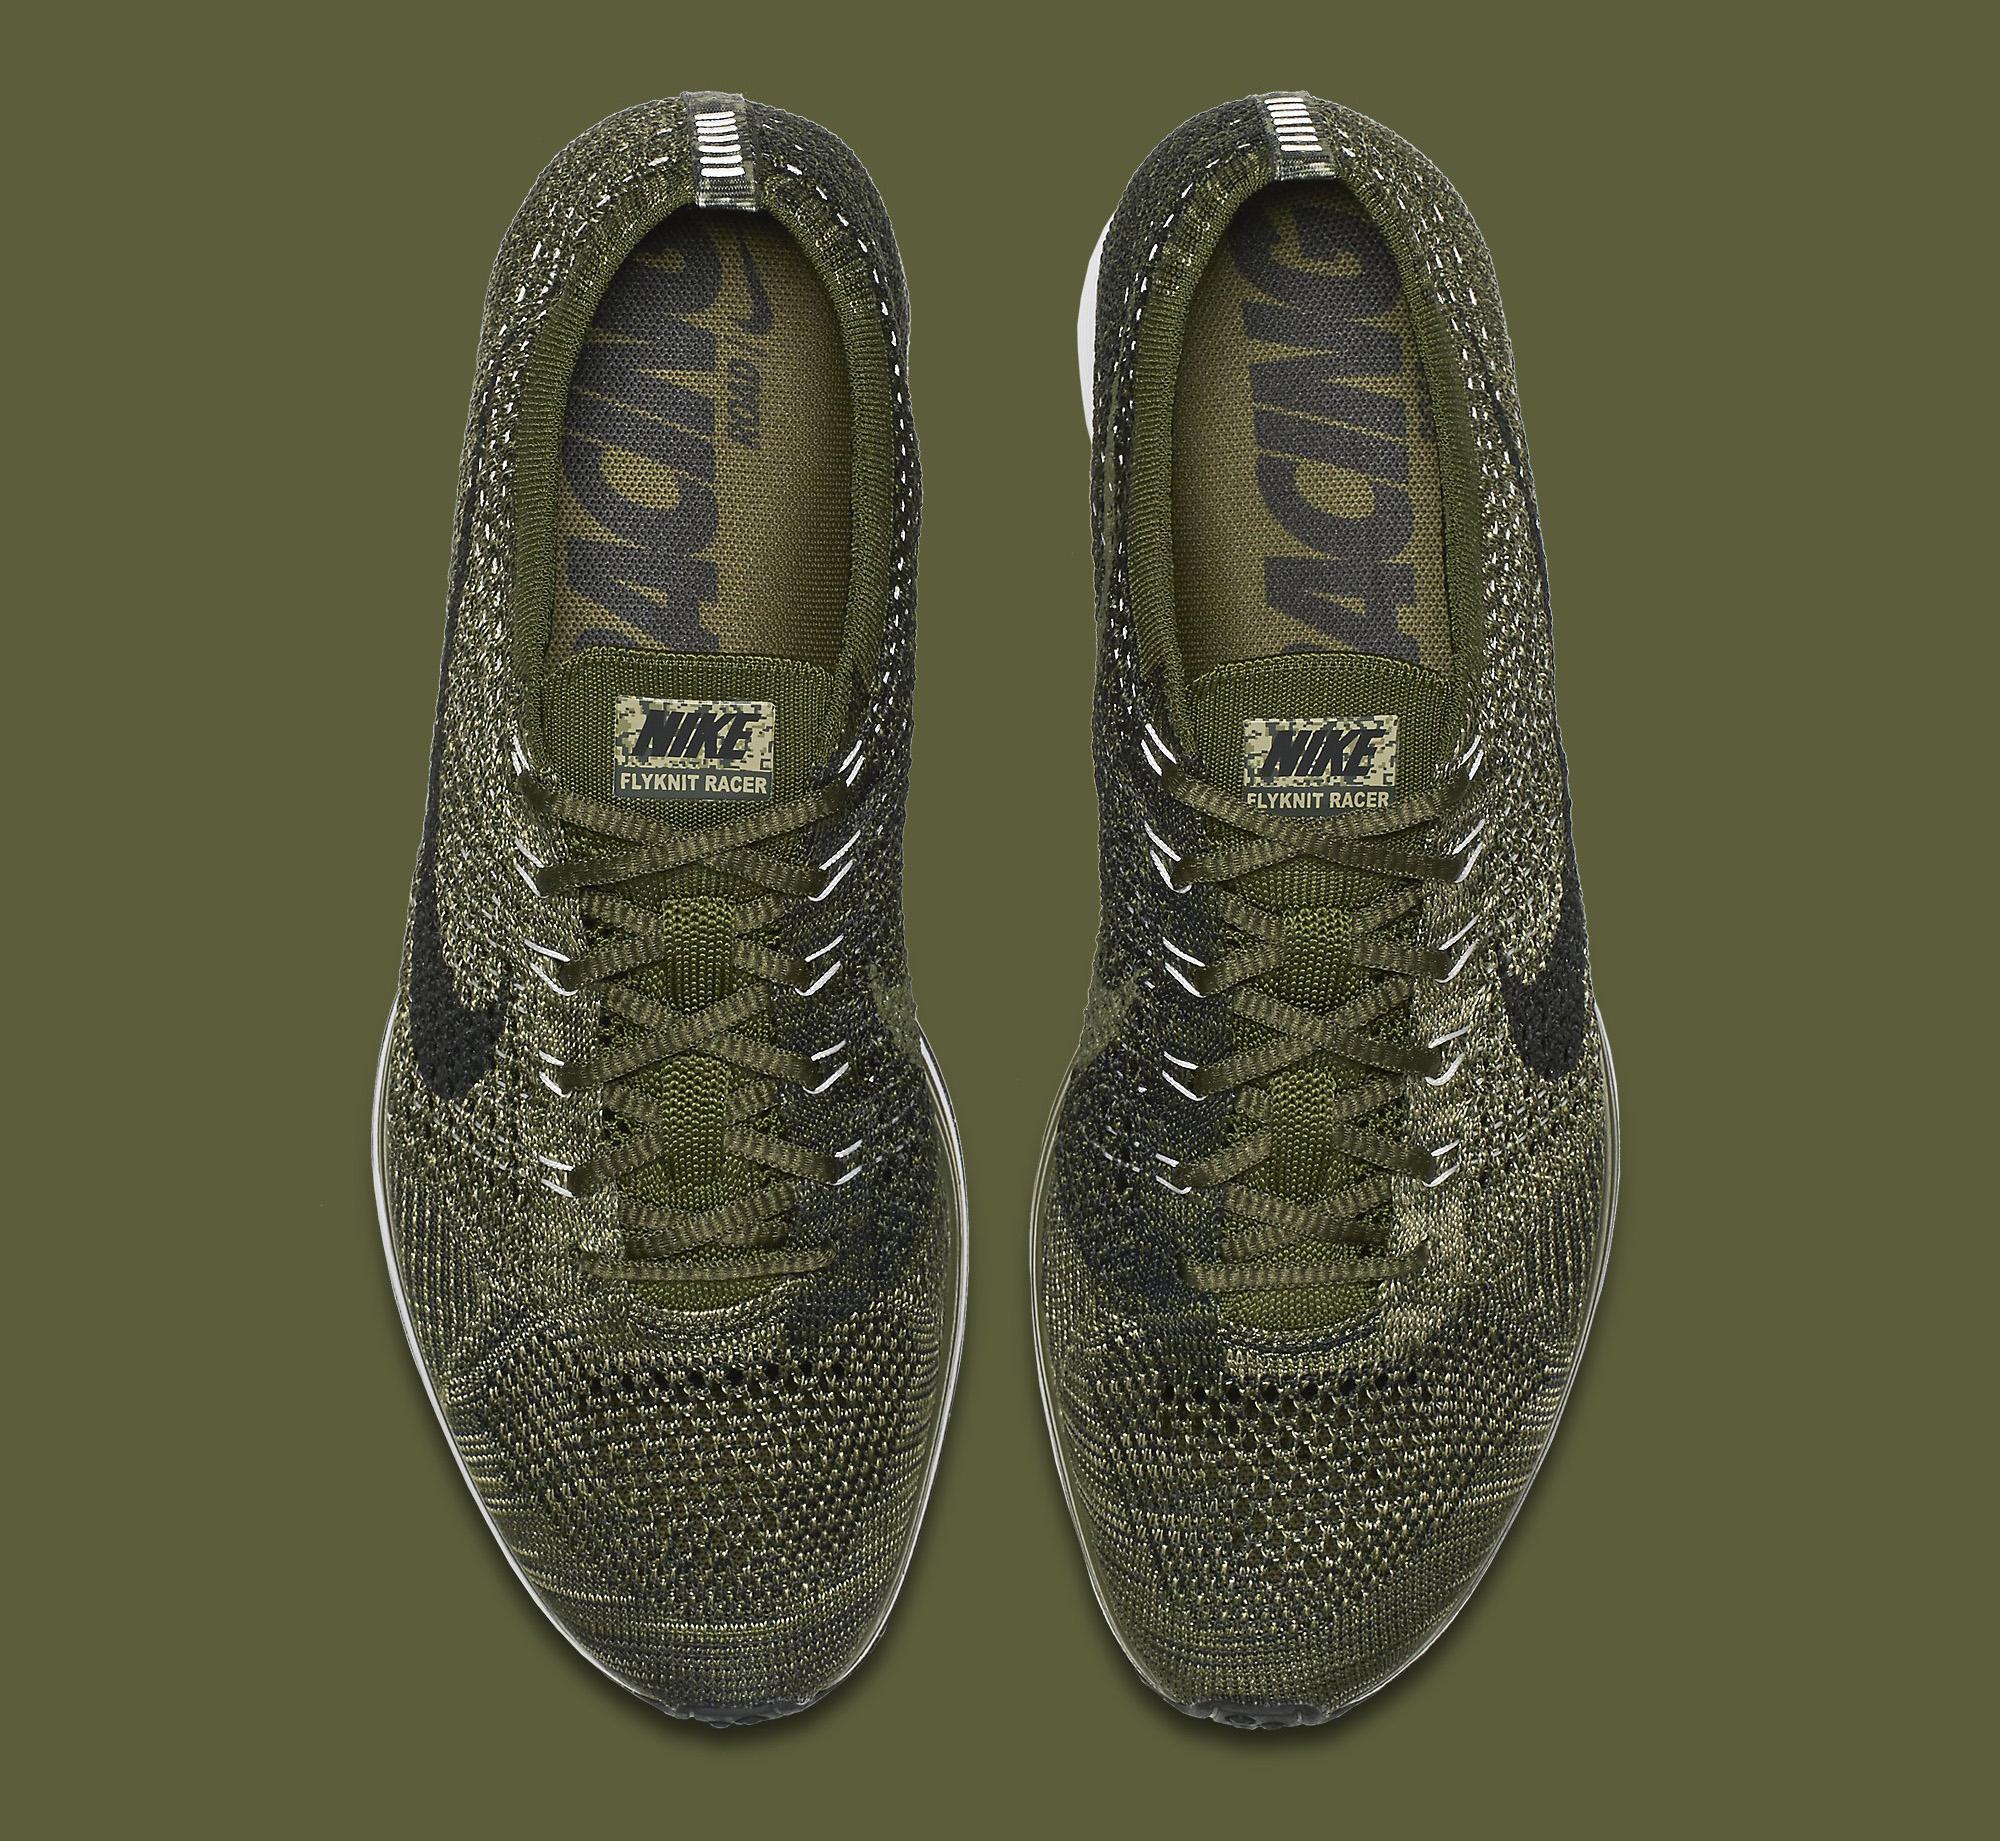 Nike Flyknit Racer Green Camo 862713-300 Top